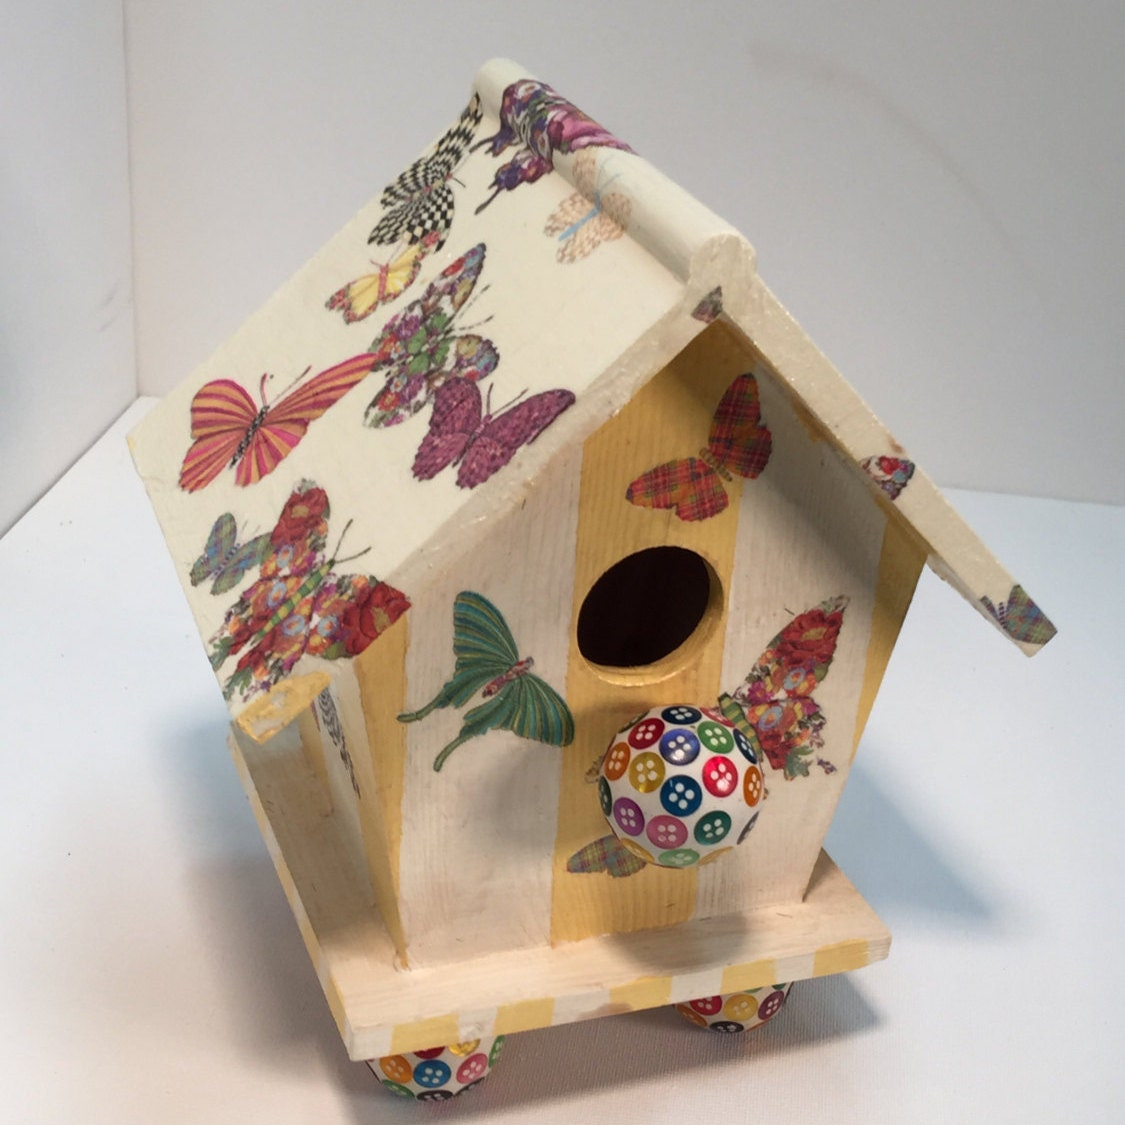 whimsical bird house by Katestwistedthystle on Etsy